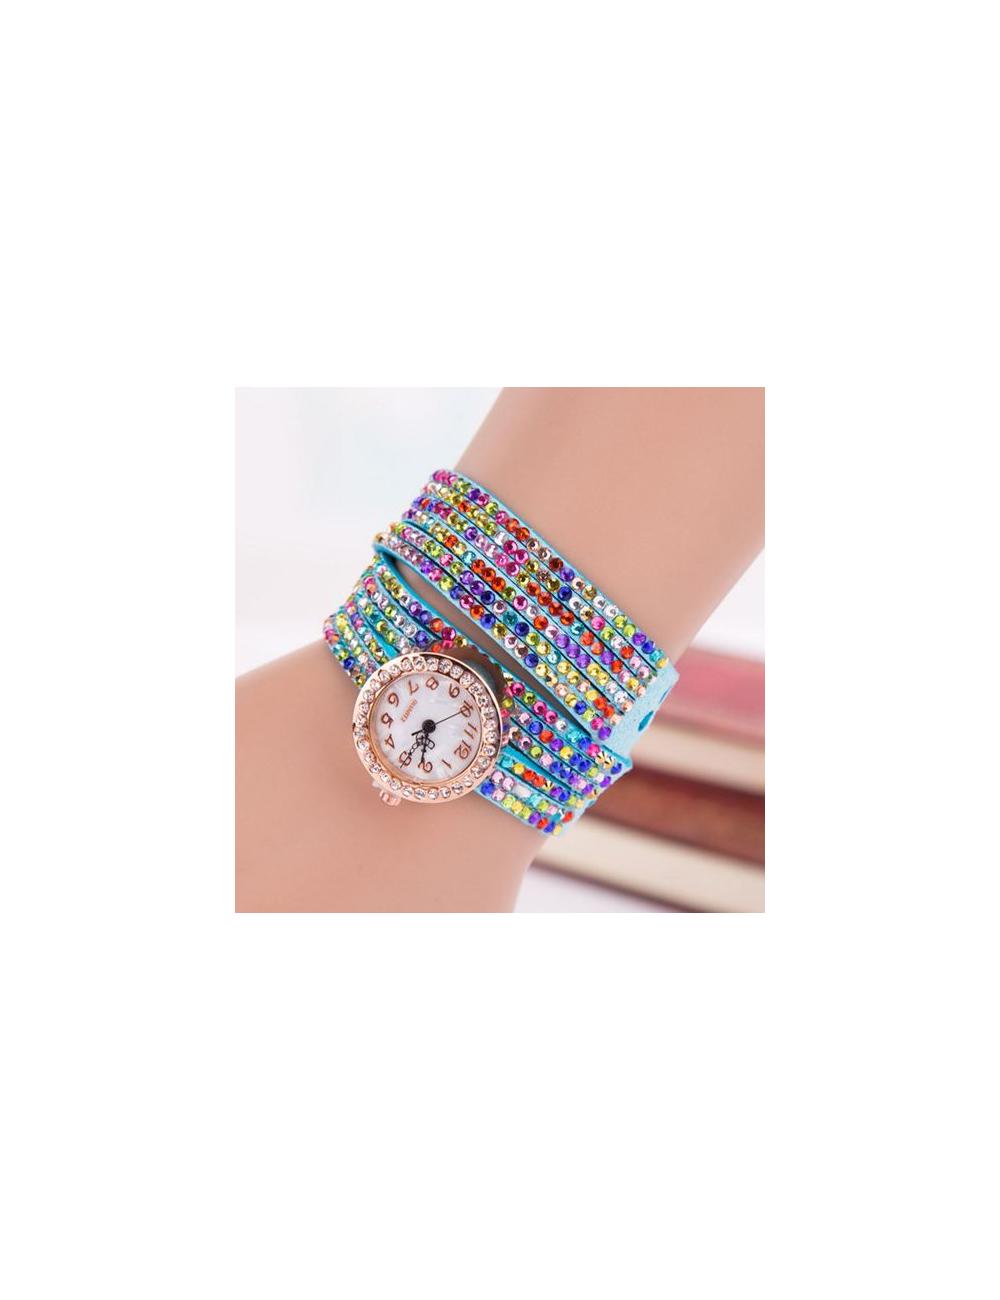 Reloj Pedreria Dayoshop $31.900